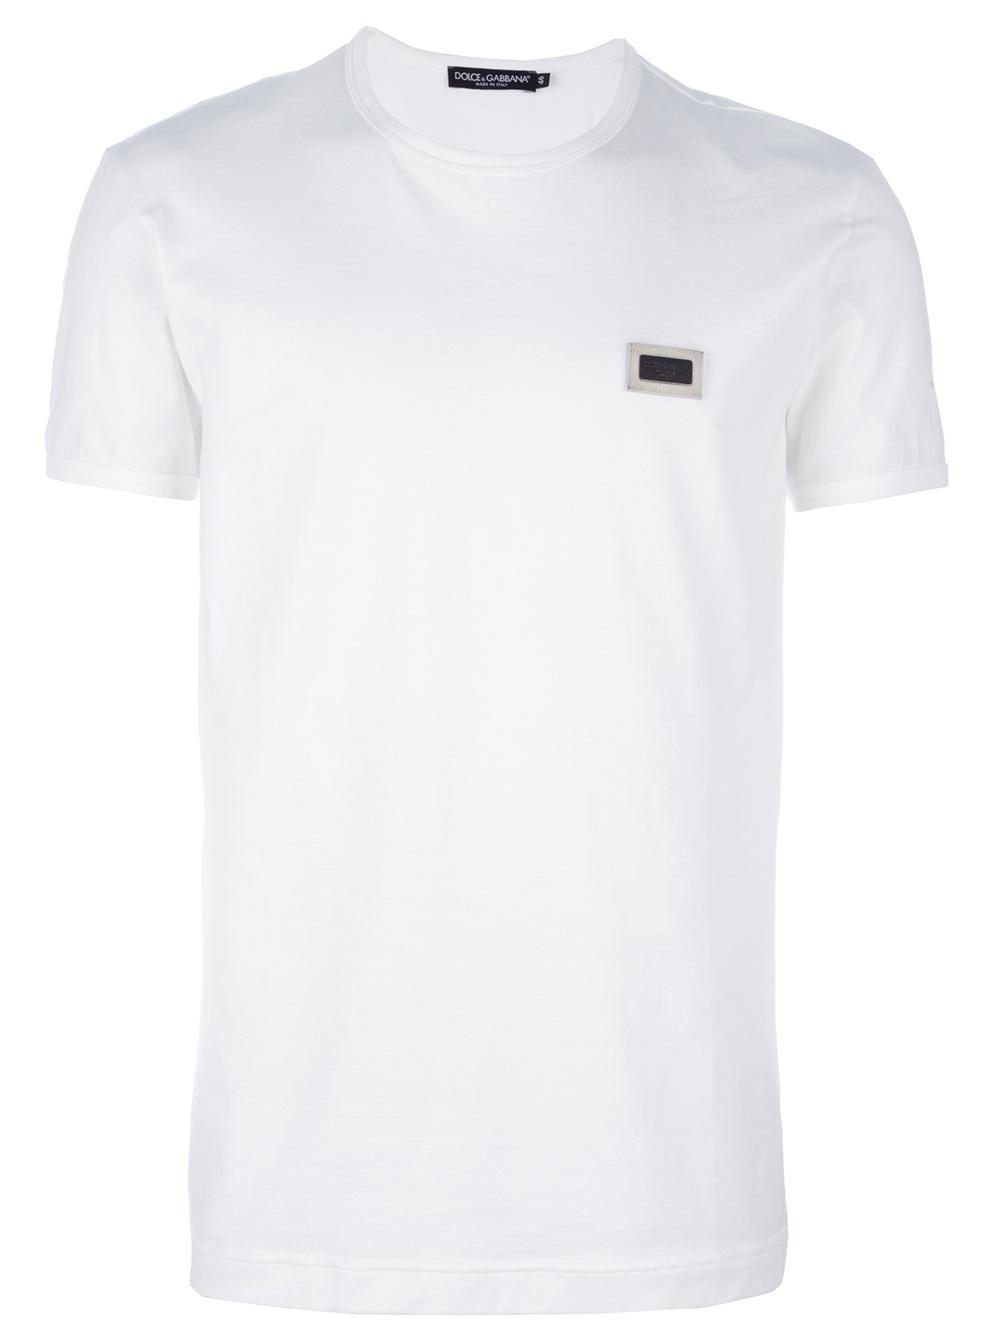 dolce gabbana logo patch t shirt in white for men lyst. Black Bedroom Furniture Sets. Home Design Ideas